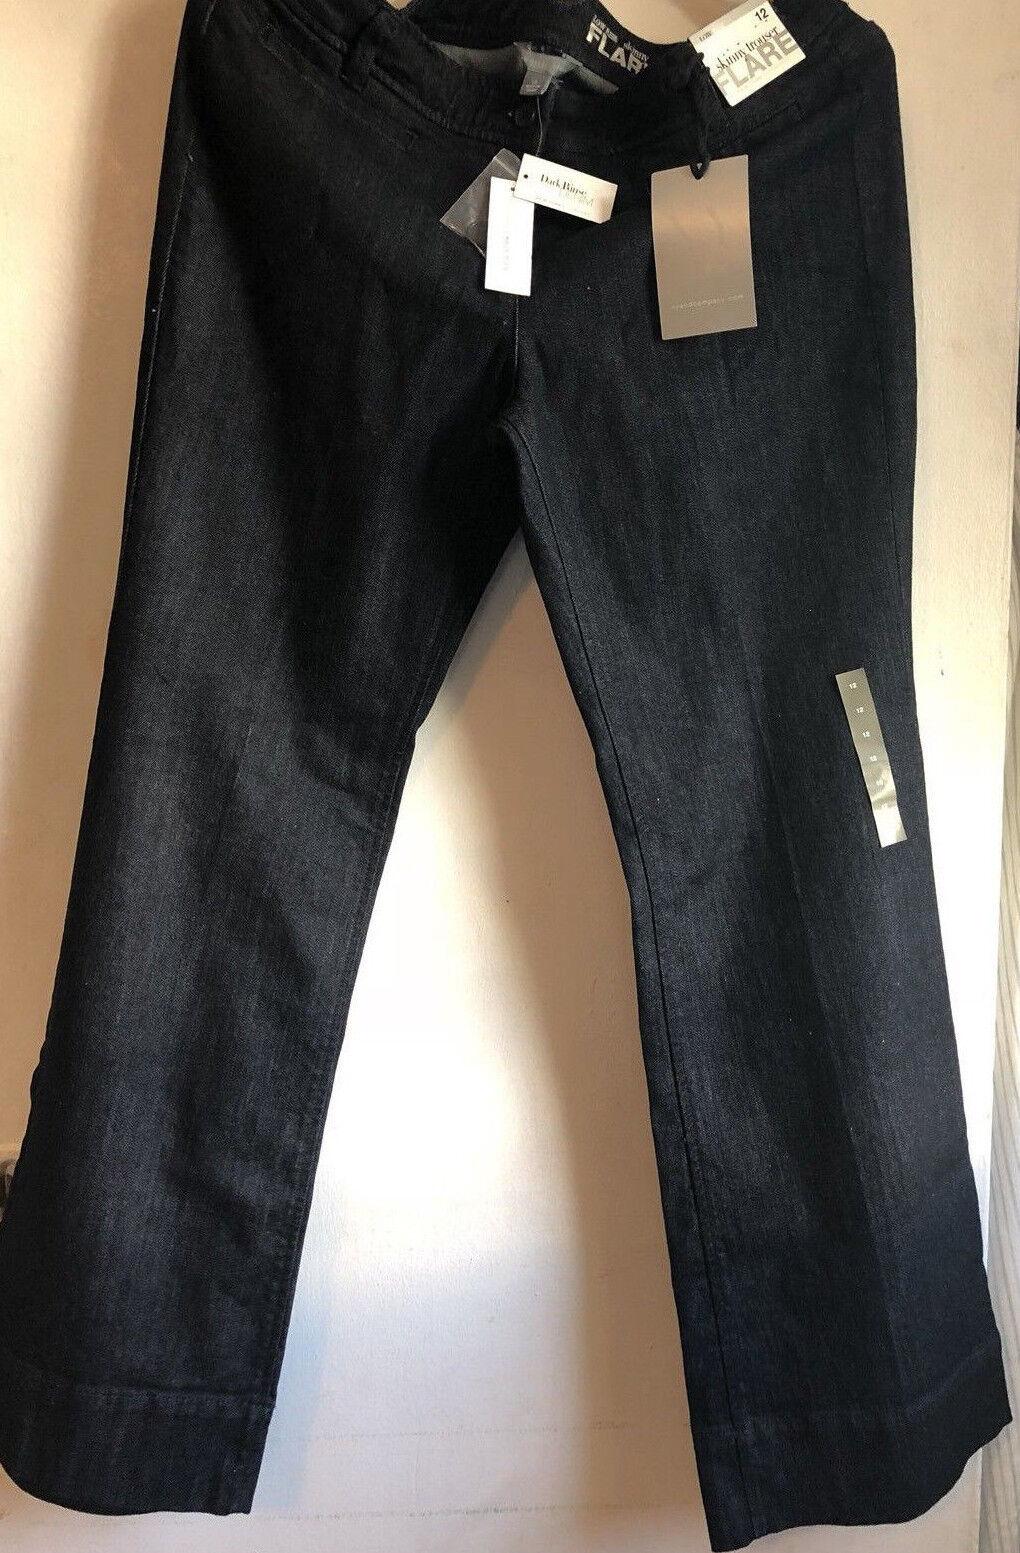 NWT Women's New York & Company Low rise Skinny Flare Leg Deep bluee Jeans Sz 12